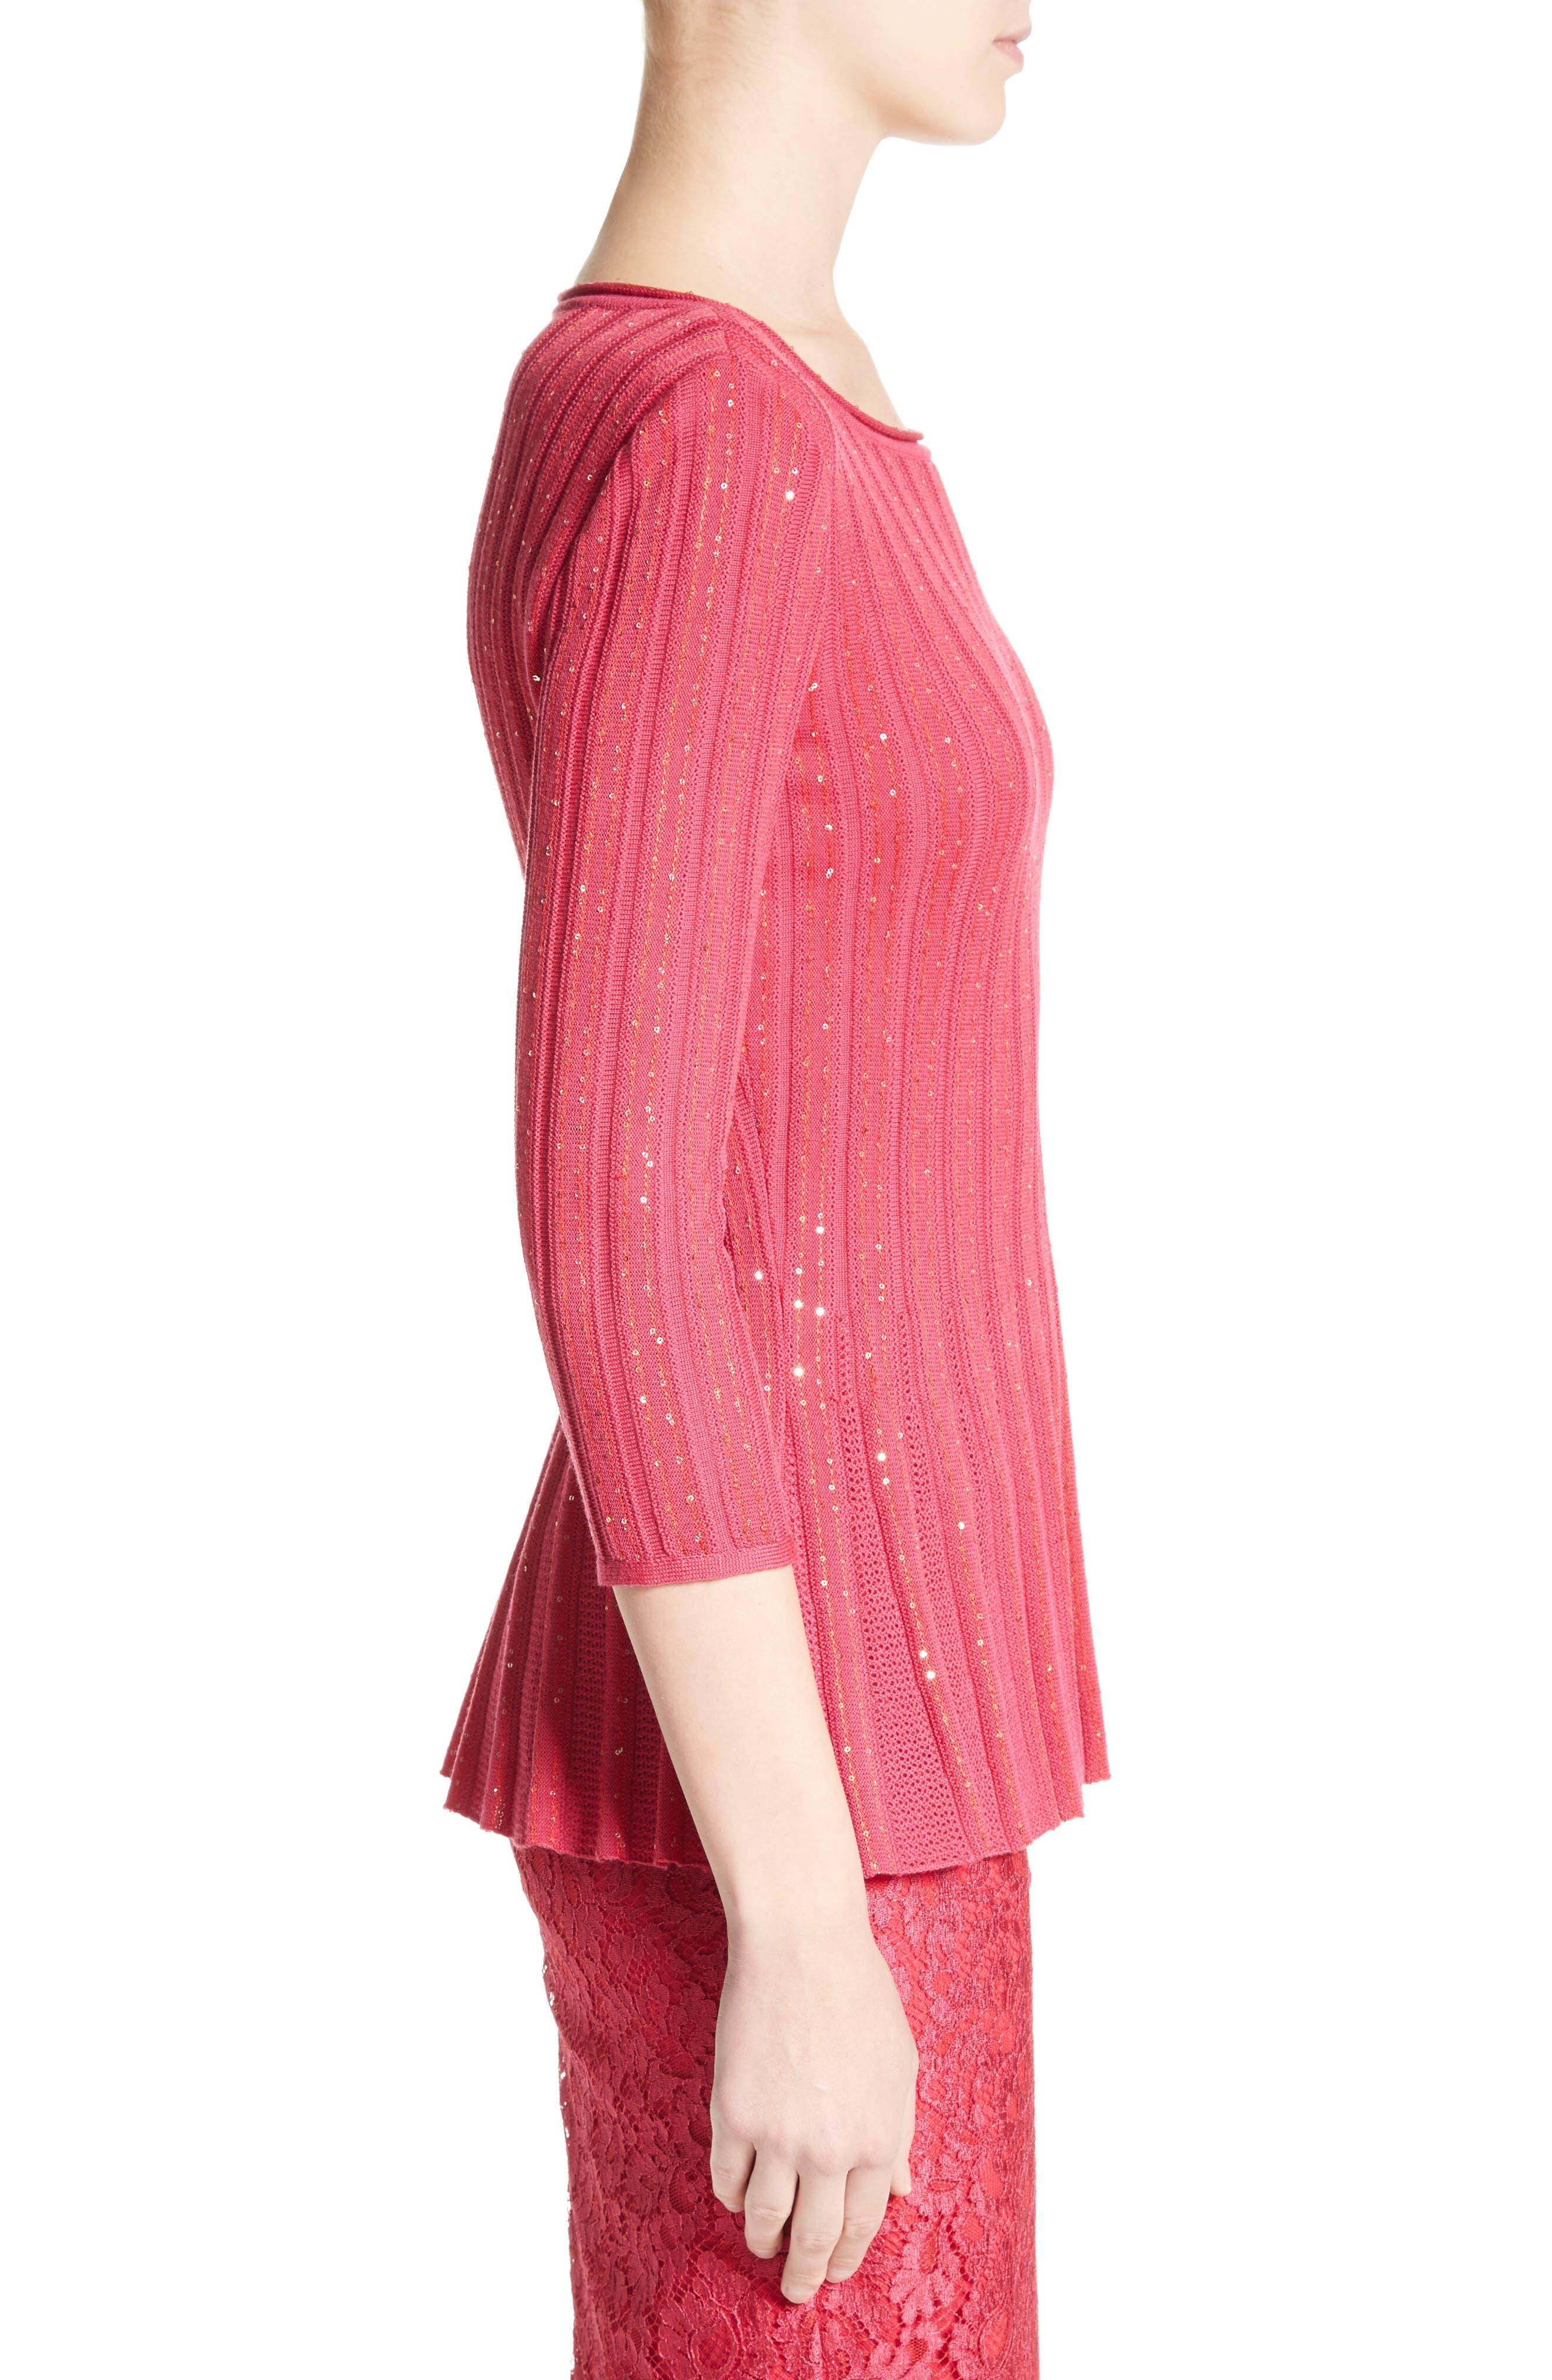 Chriag Sequin Knit Peplum Top,                             Alternate thumbnail 3, color,                             Indian Rose